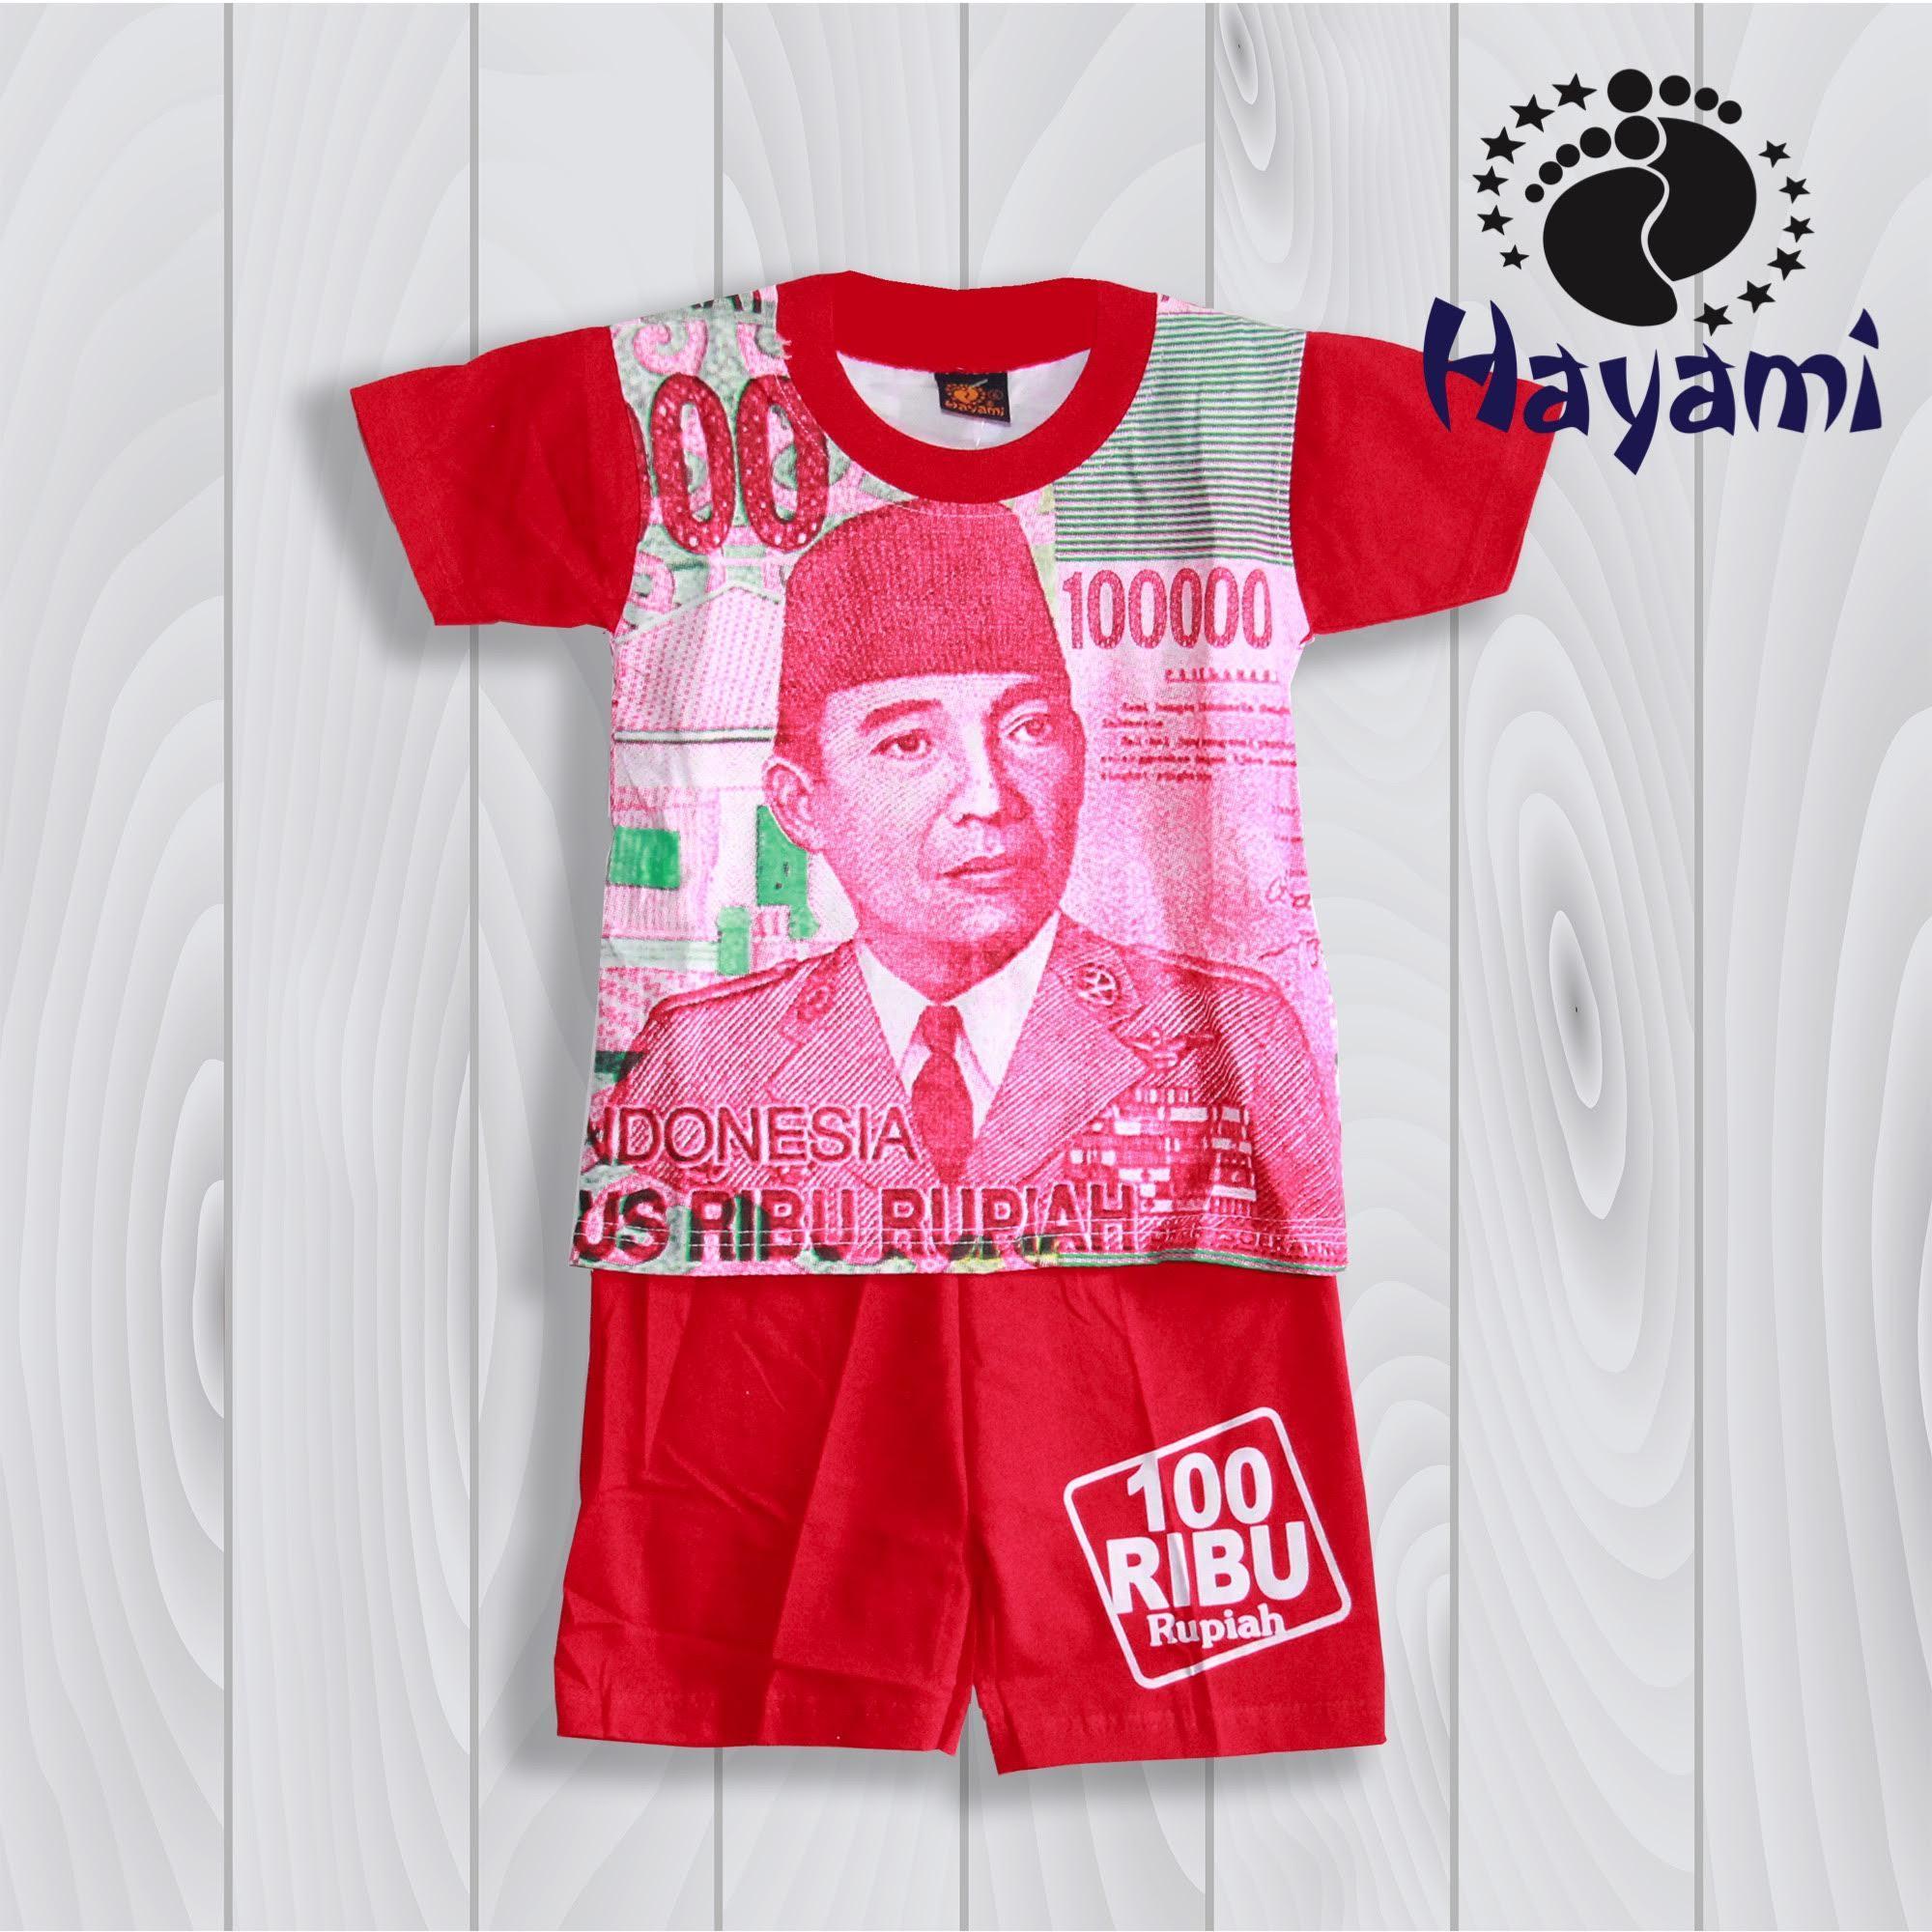 Jual Ready Stock Voucher Indomaret 100 Ribu 100rb Termurah Seratus Hayami Baju Kaos Anak Laki Uang 100ribu Lama